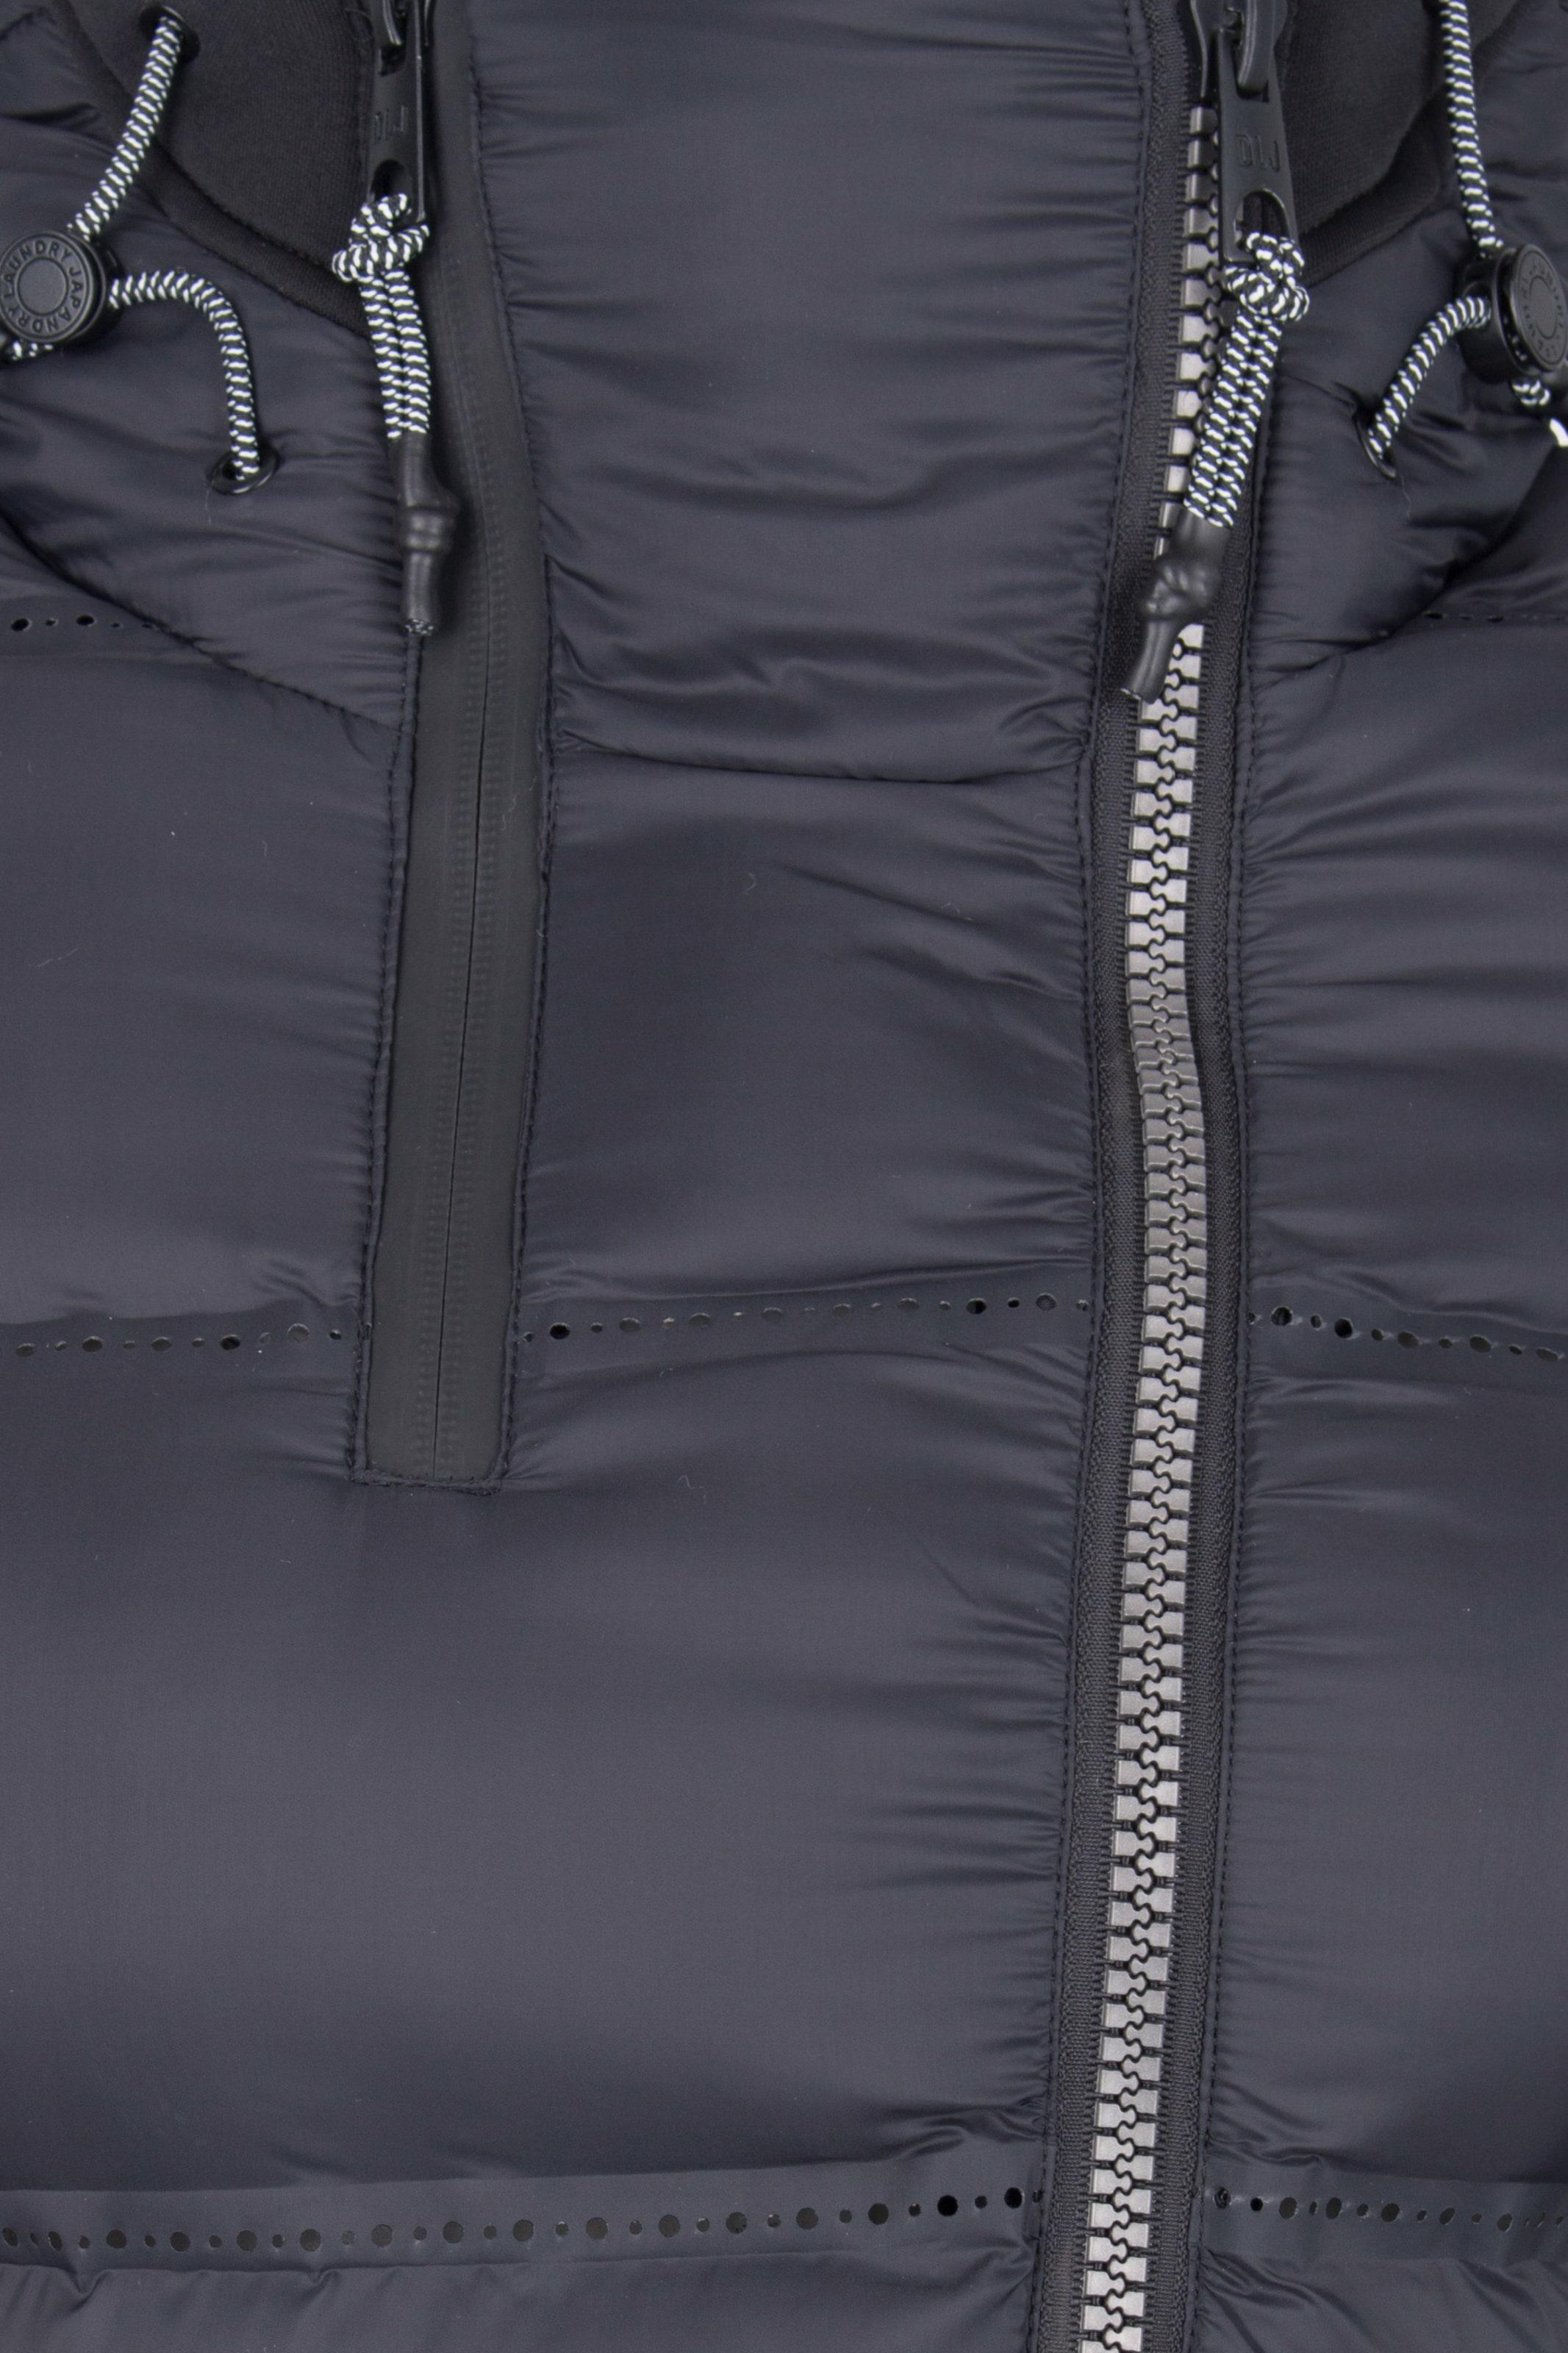 Noir Parka D'hiver Laundry En Dry fbgy7mIY6v